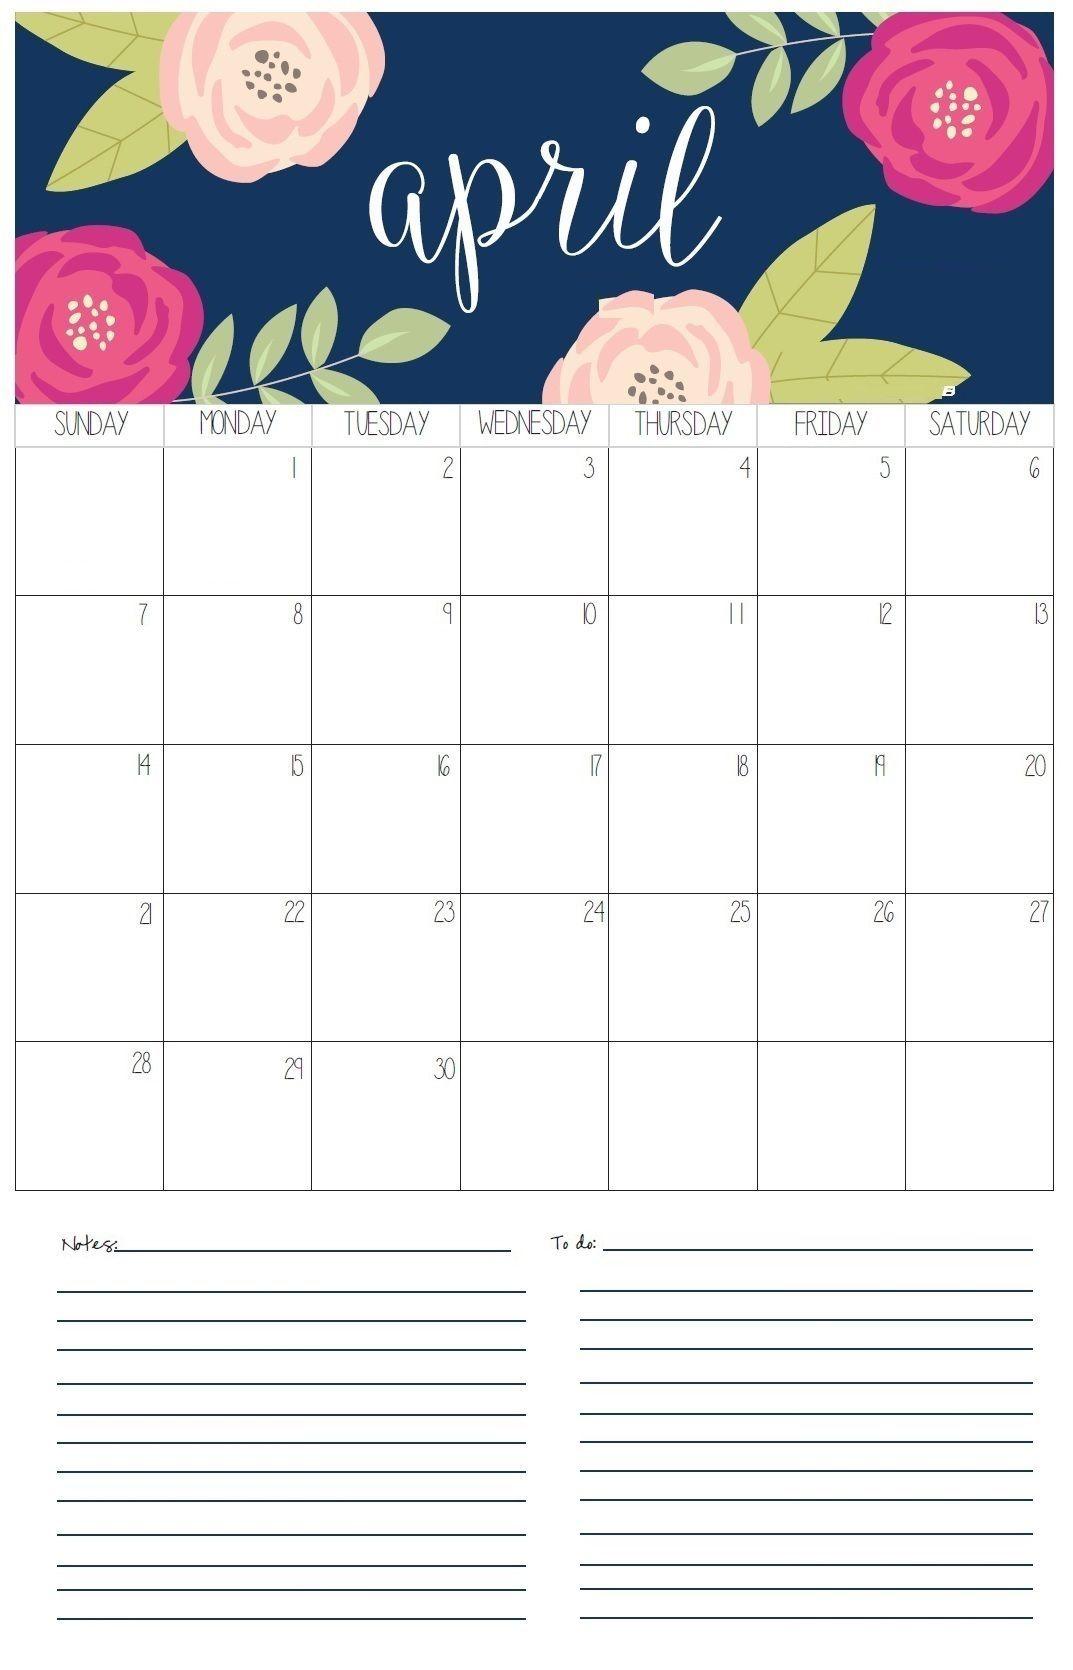 April 2019 Desk And Wall Calendar Wall Calendar Print Calendar